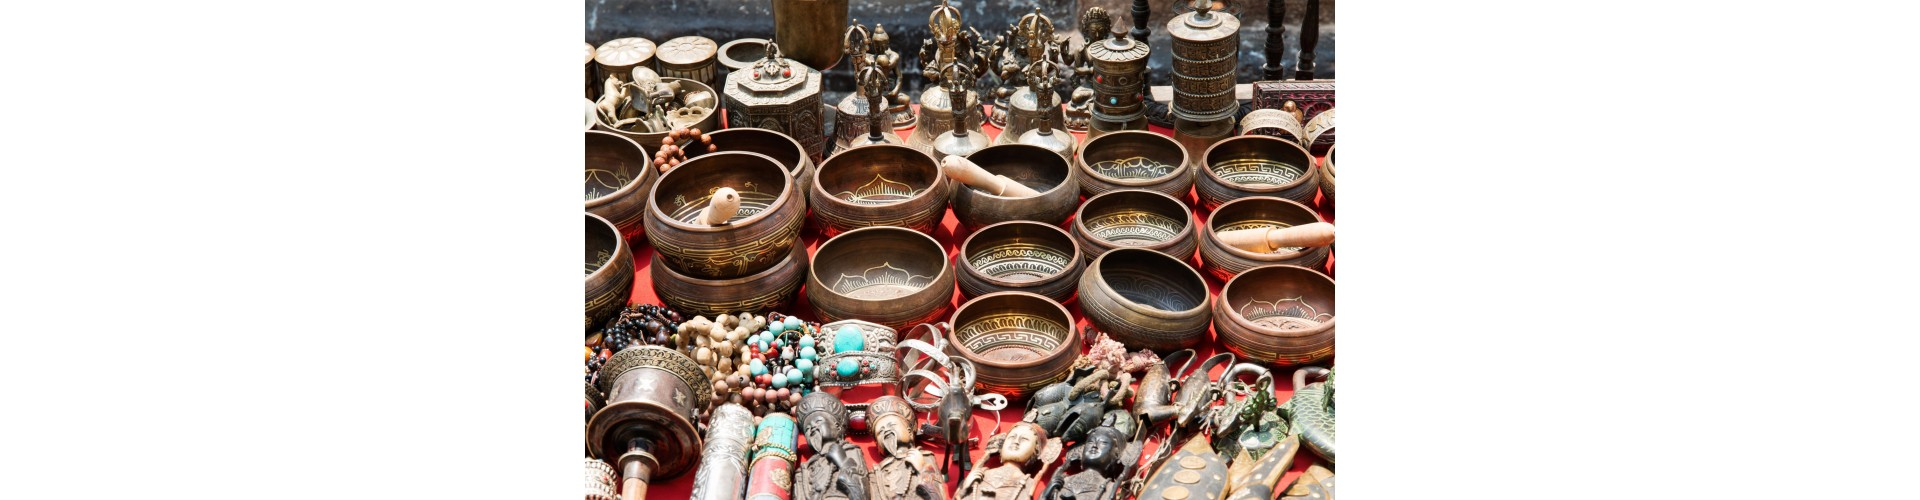 Bols chantants sept métaux